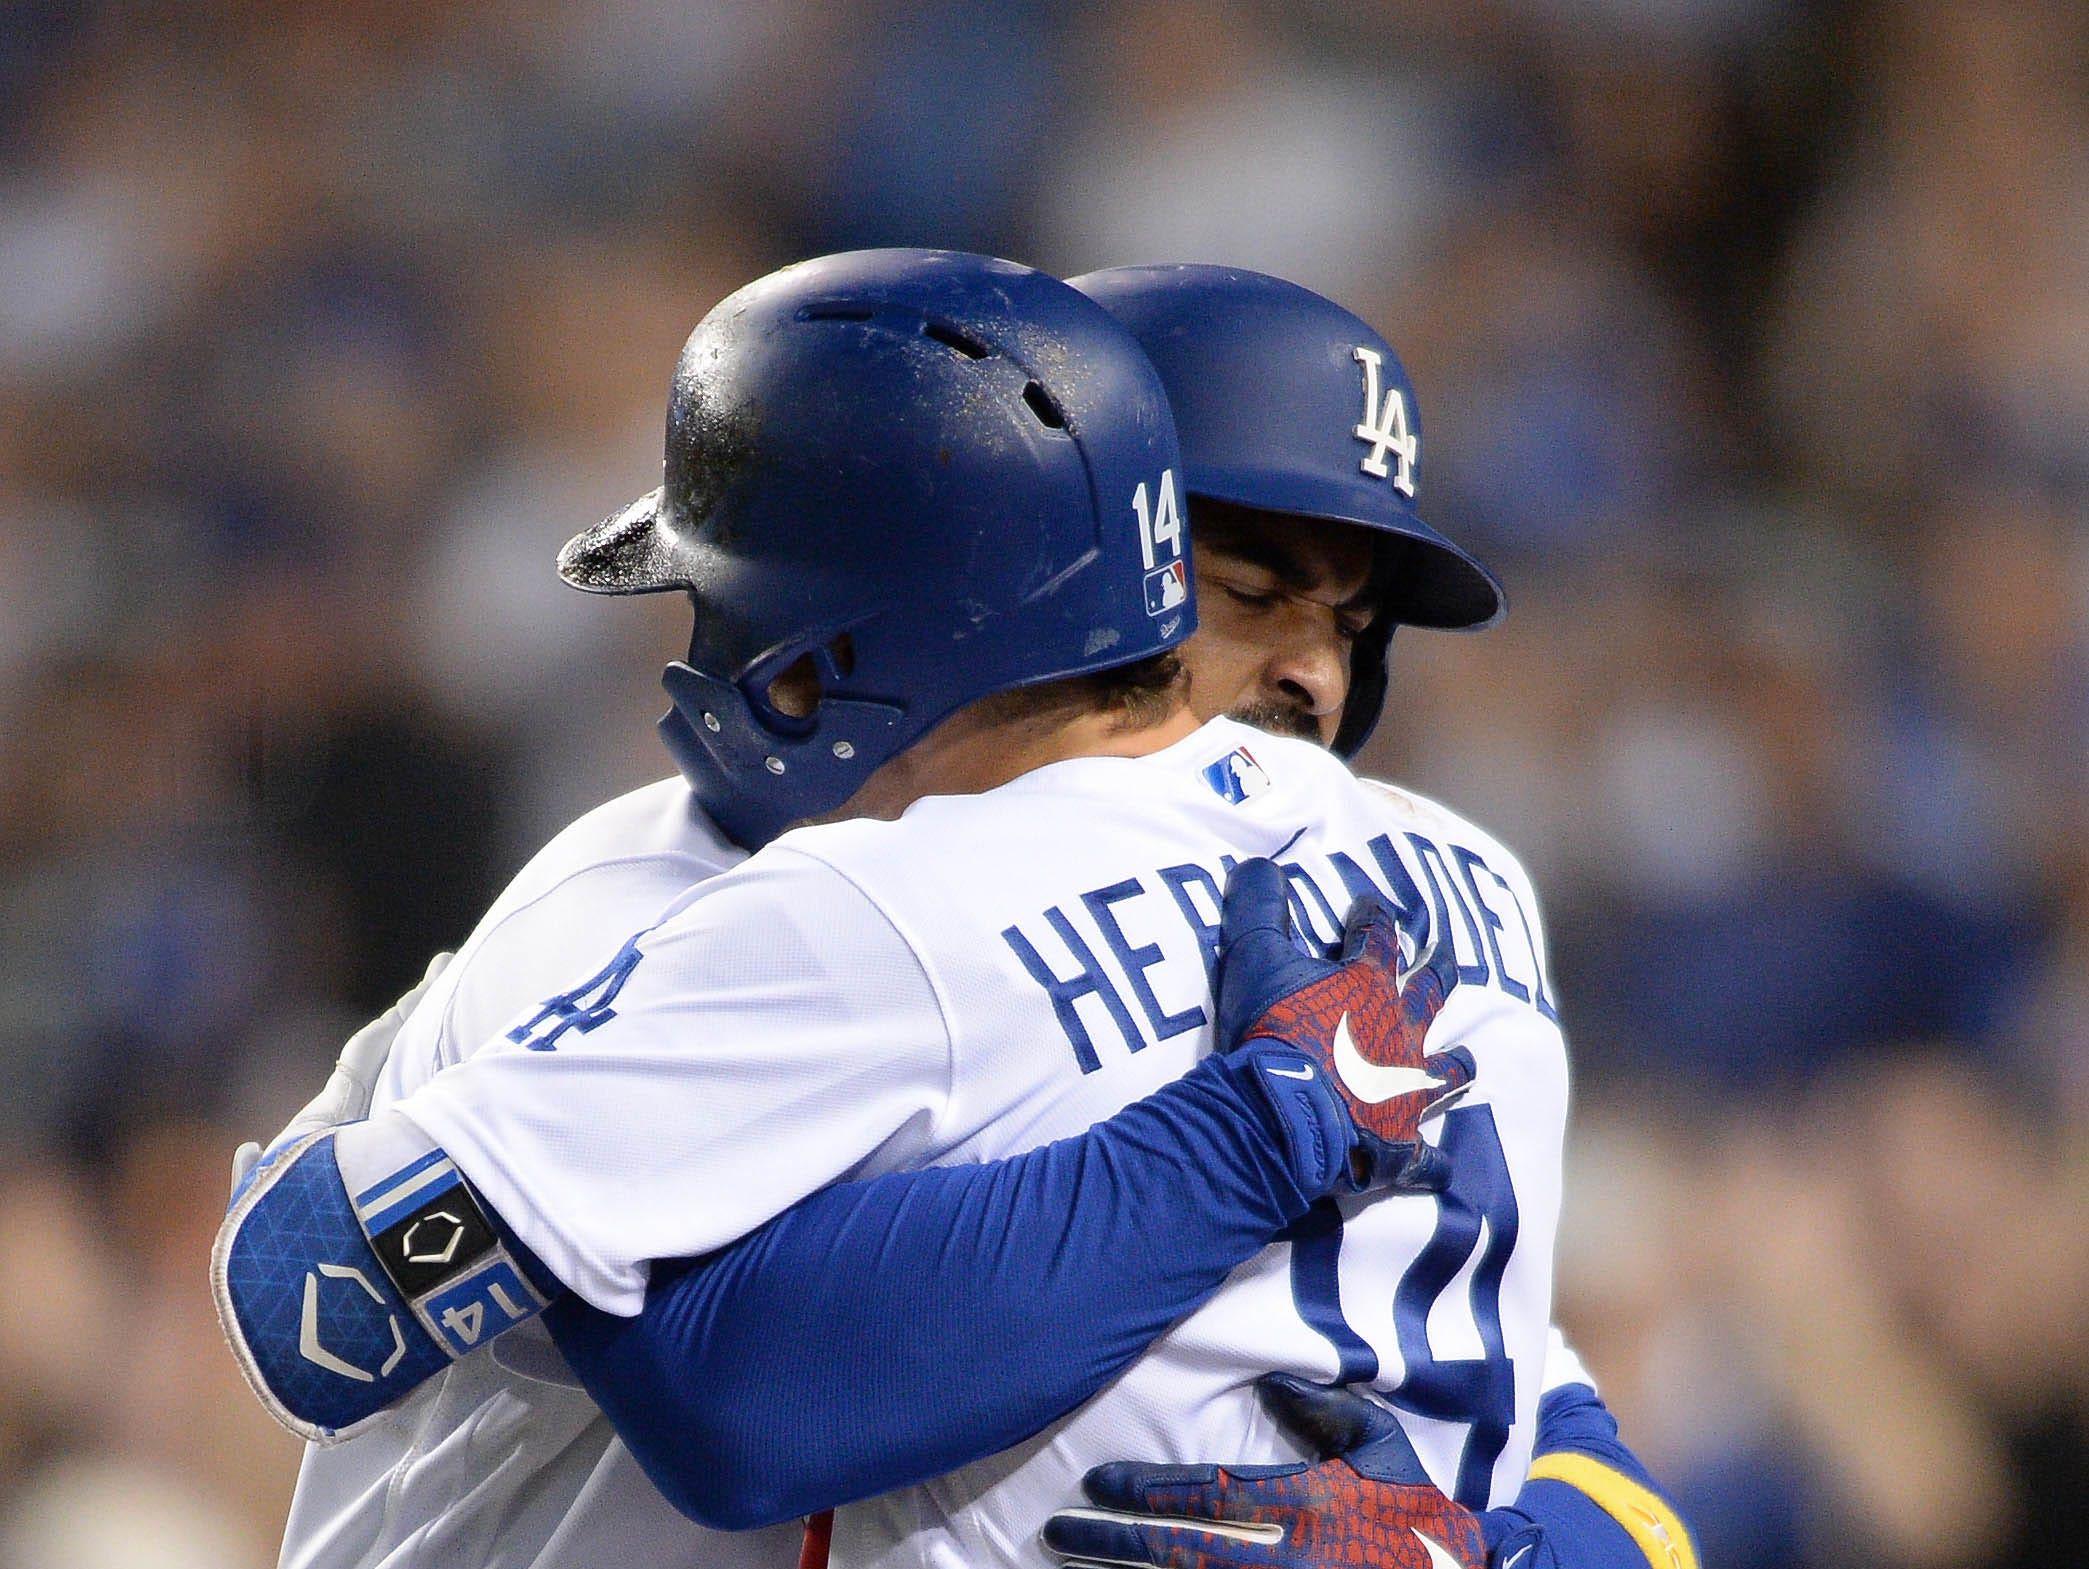 Sep 1, 2018; Los Angeles, CA, USA; Los Angeles Dodgers left fielder Matt Kemp (left) is greeted by center fielder Enrique Hernandez (14) after Kemp hit a three-run home run during the eighth inning against the Arizona Diamondbacks at Dodger Stadium. Mandatory Credit: Orlando Ramirez-USA TODAY Sports